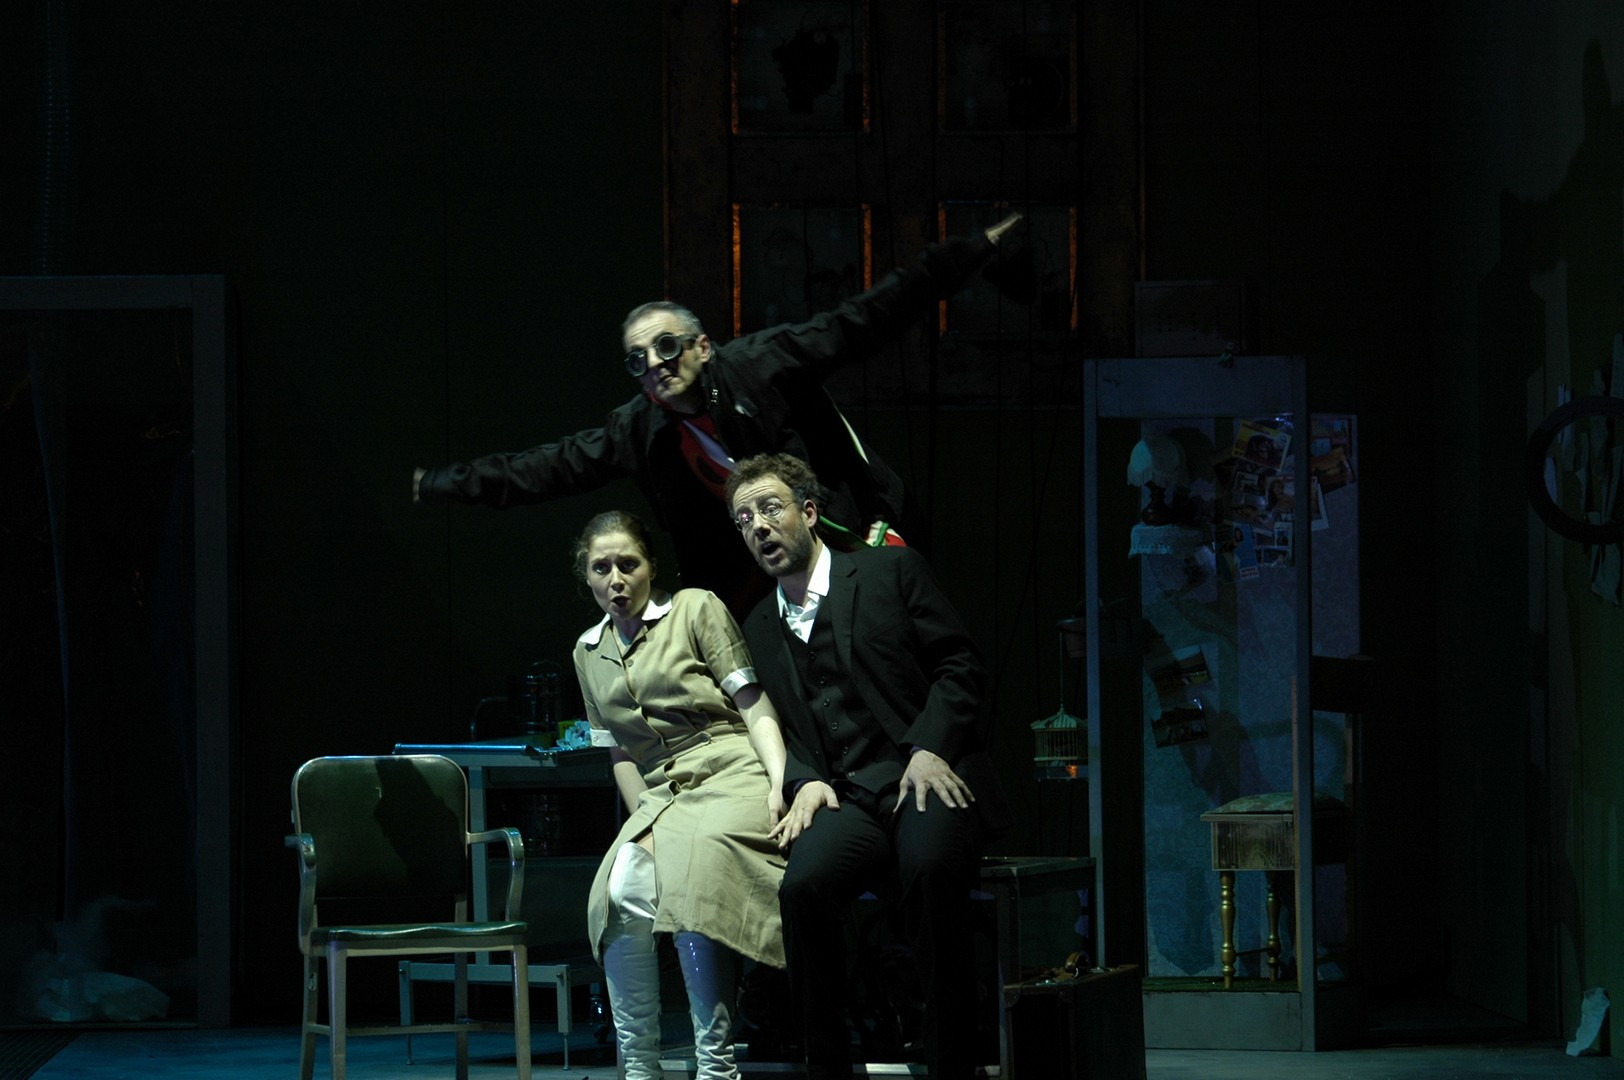 Serva-Padrona-Opera-directed-by-Jacopo-Spirei-6